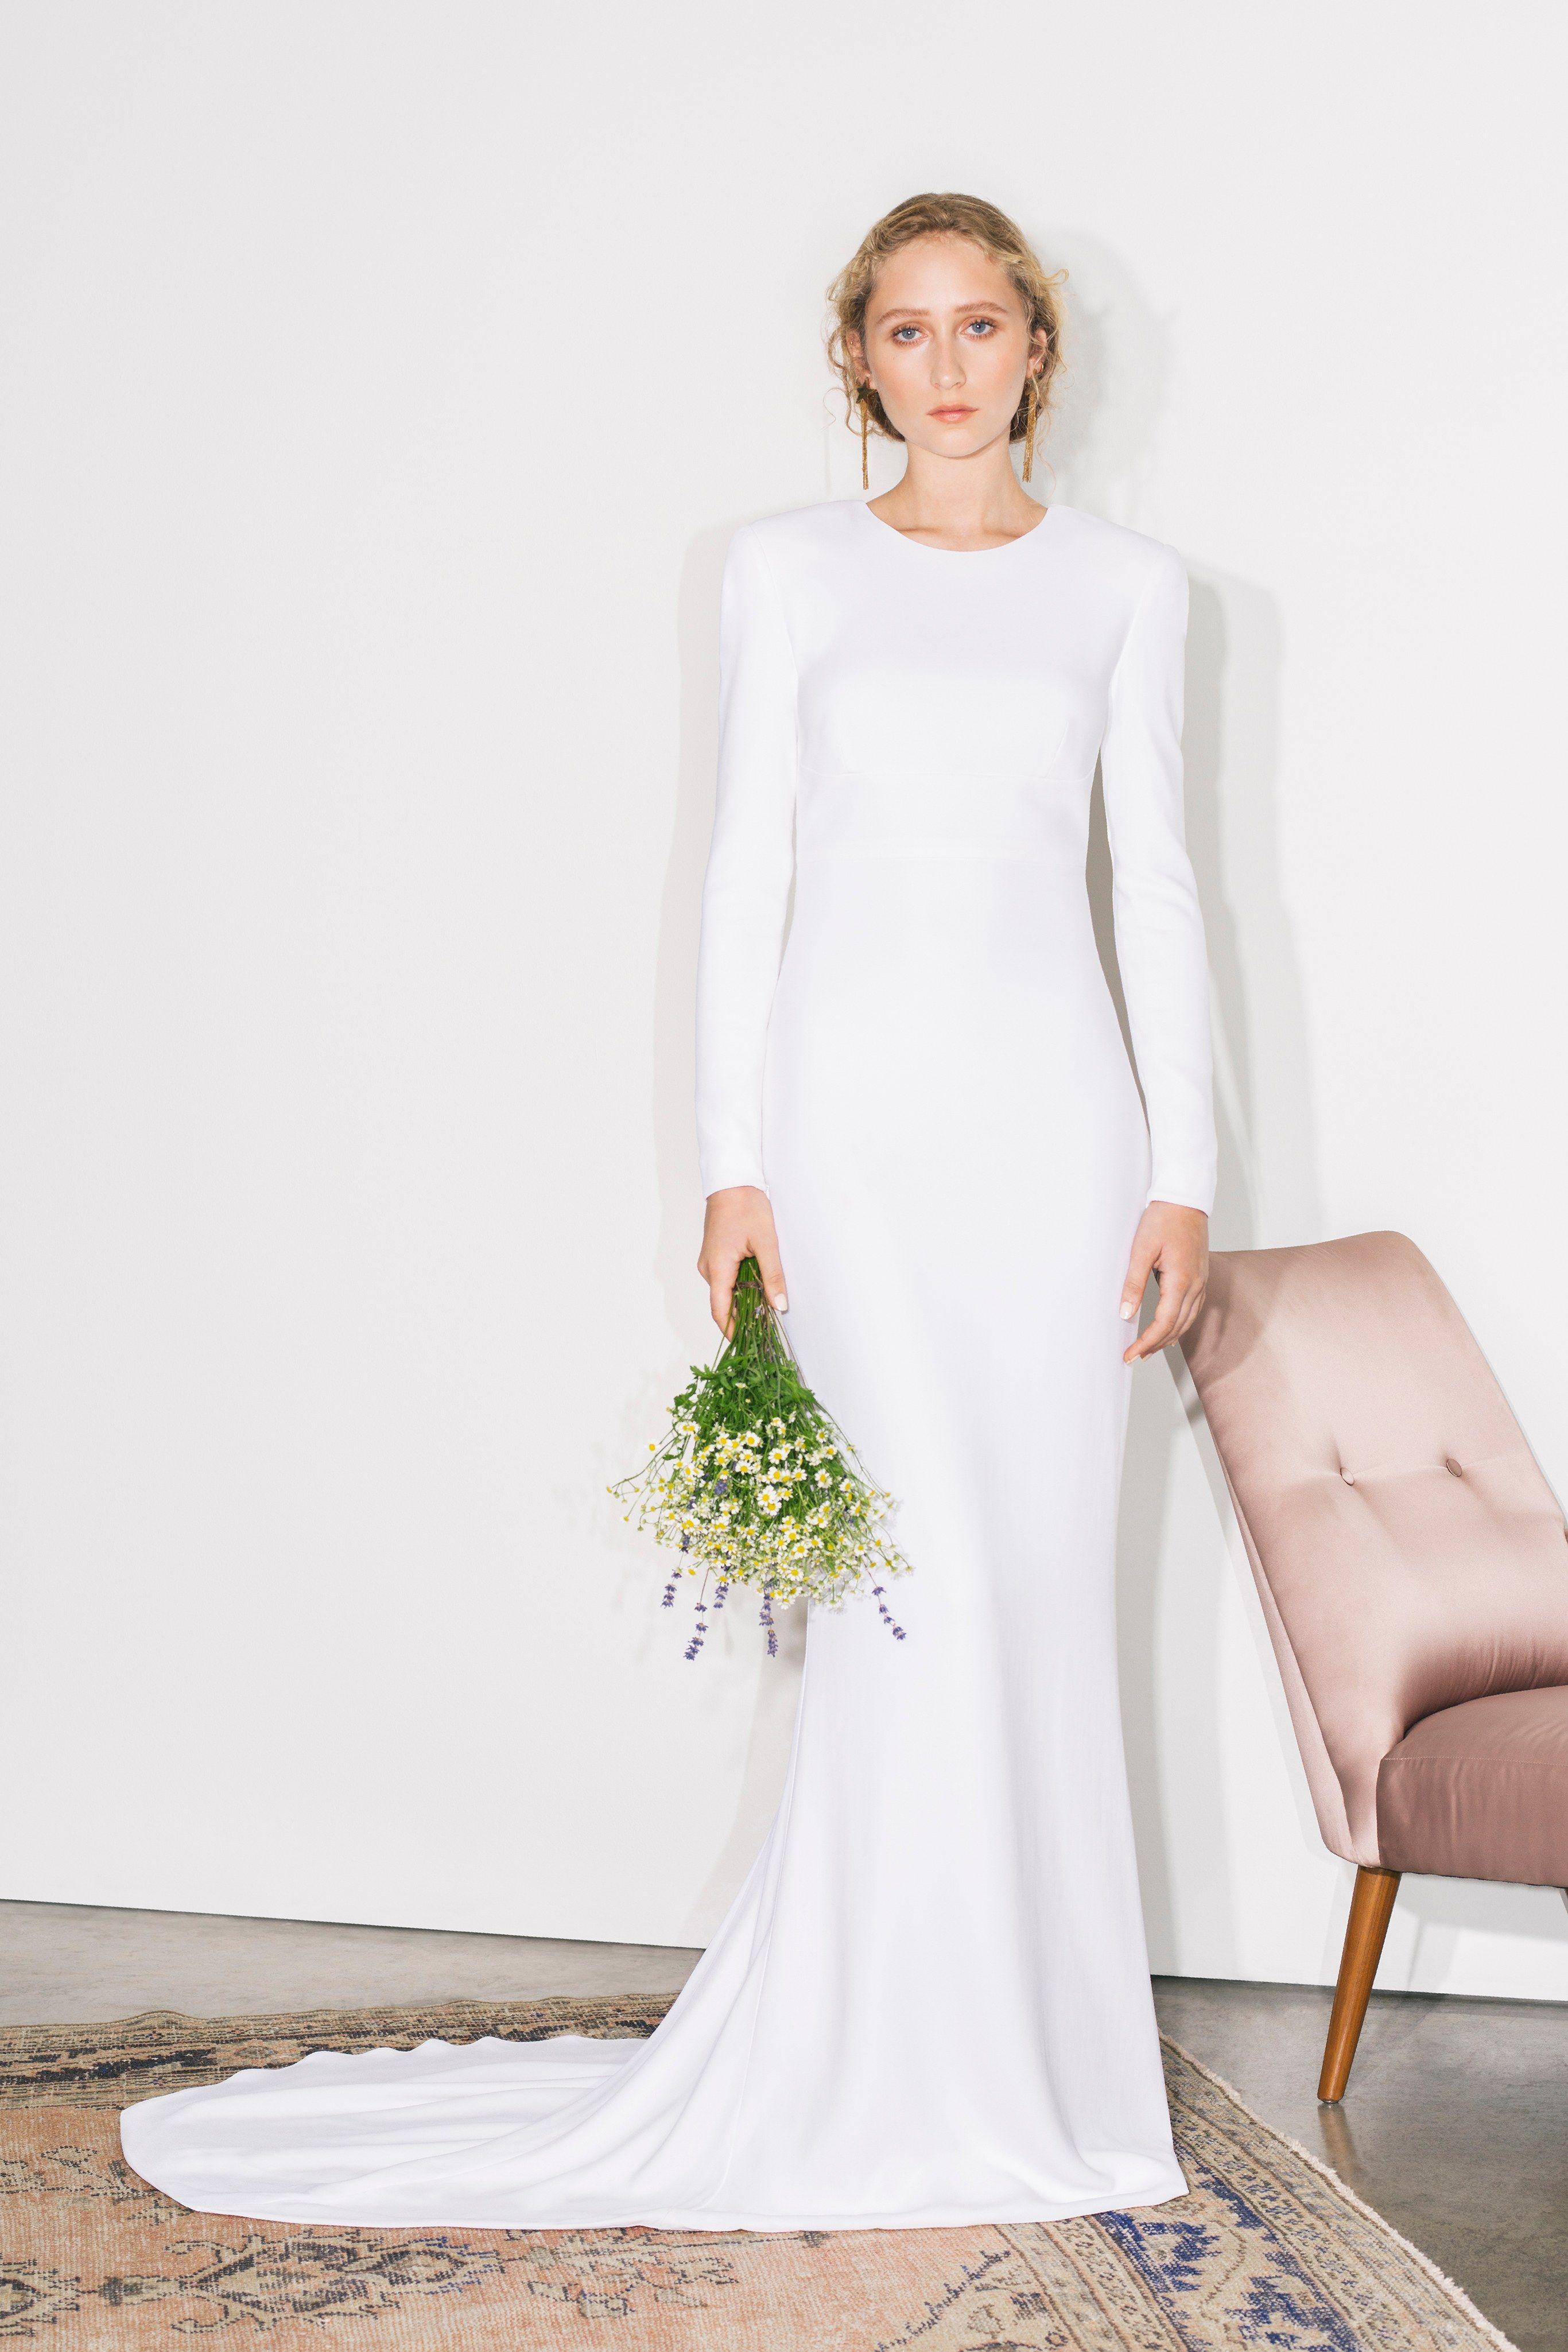 19 Best Places To Buy Wedding Dresses Online Second Wedding Dresses Wedding Dress Sleeves Givenchy Wedding Dress [ 4098 x 2732 Pixel ]